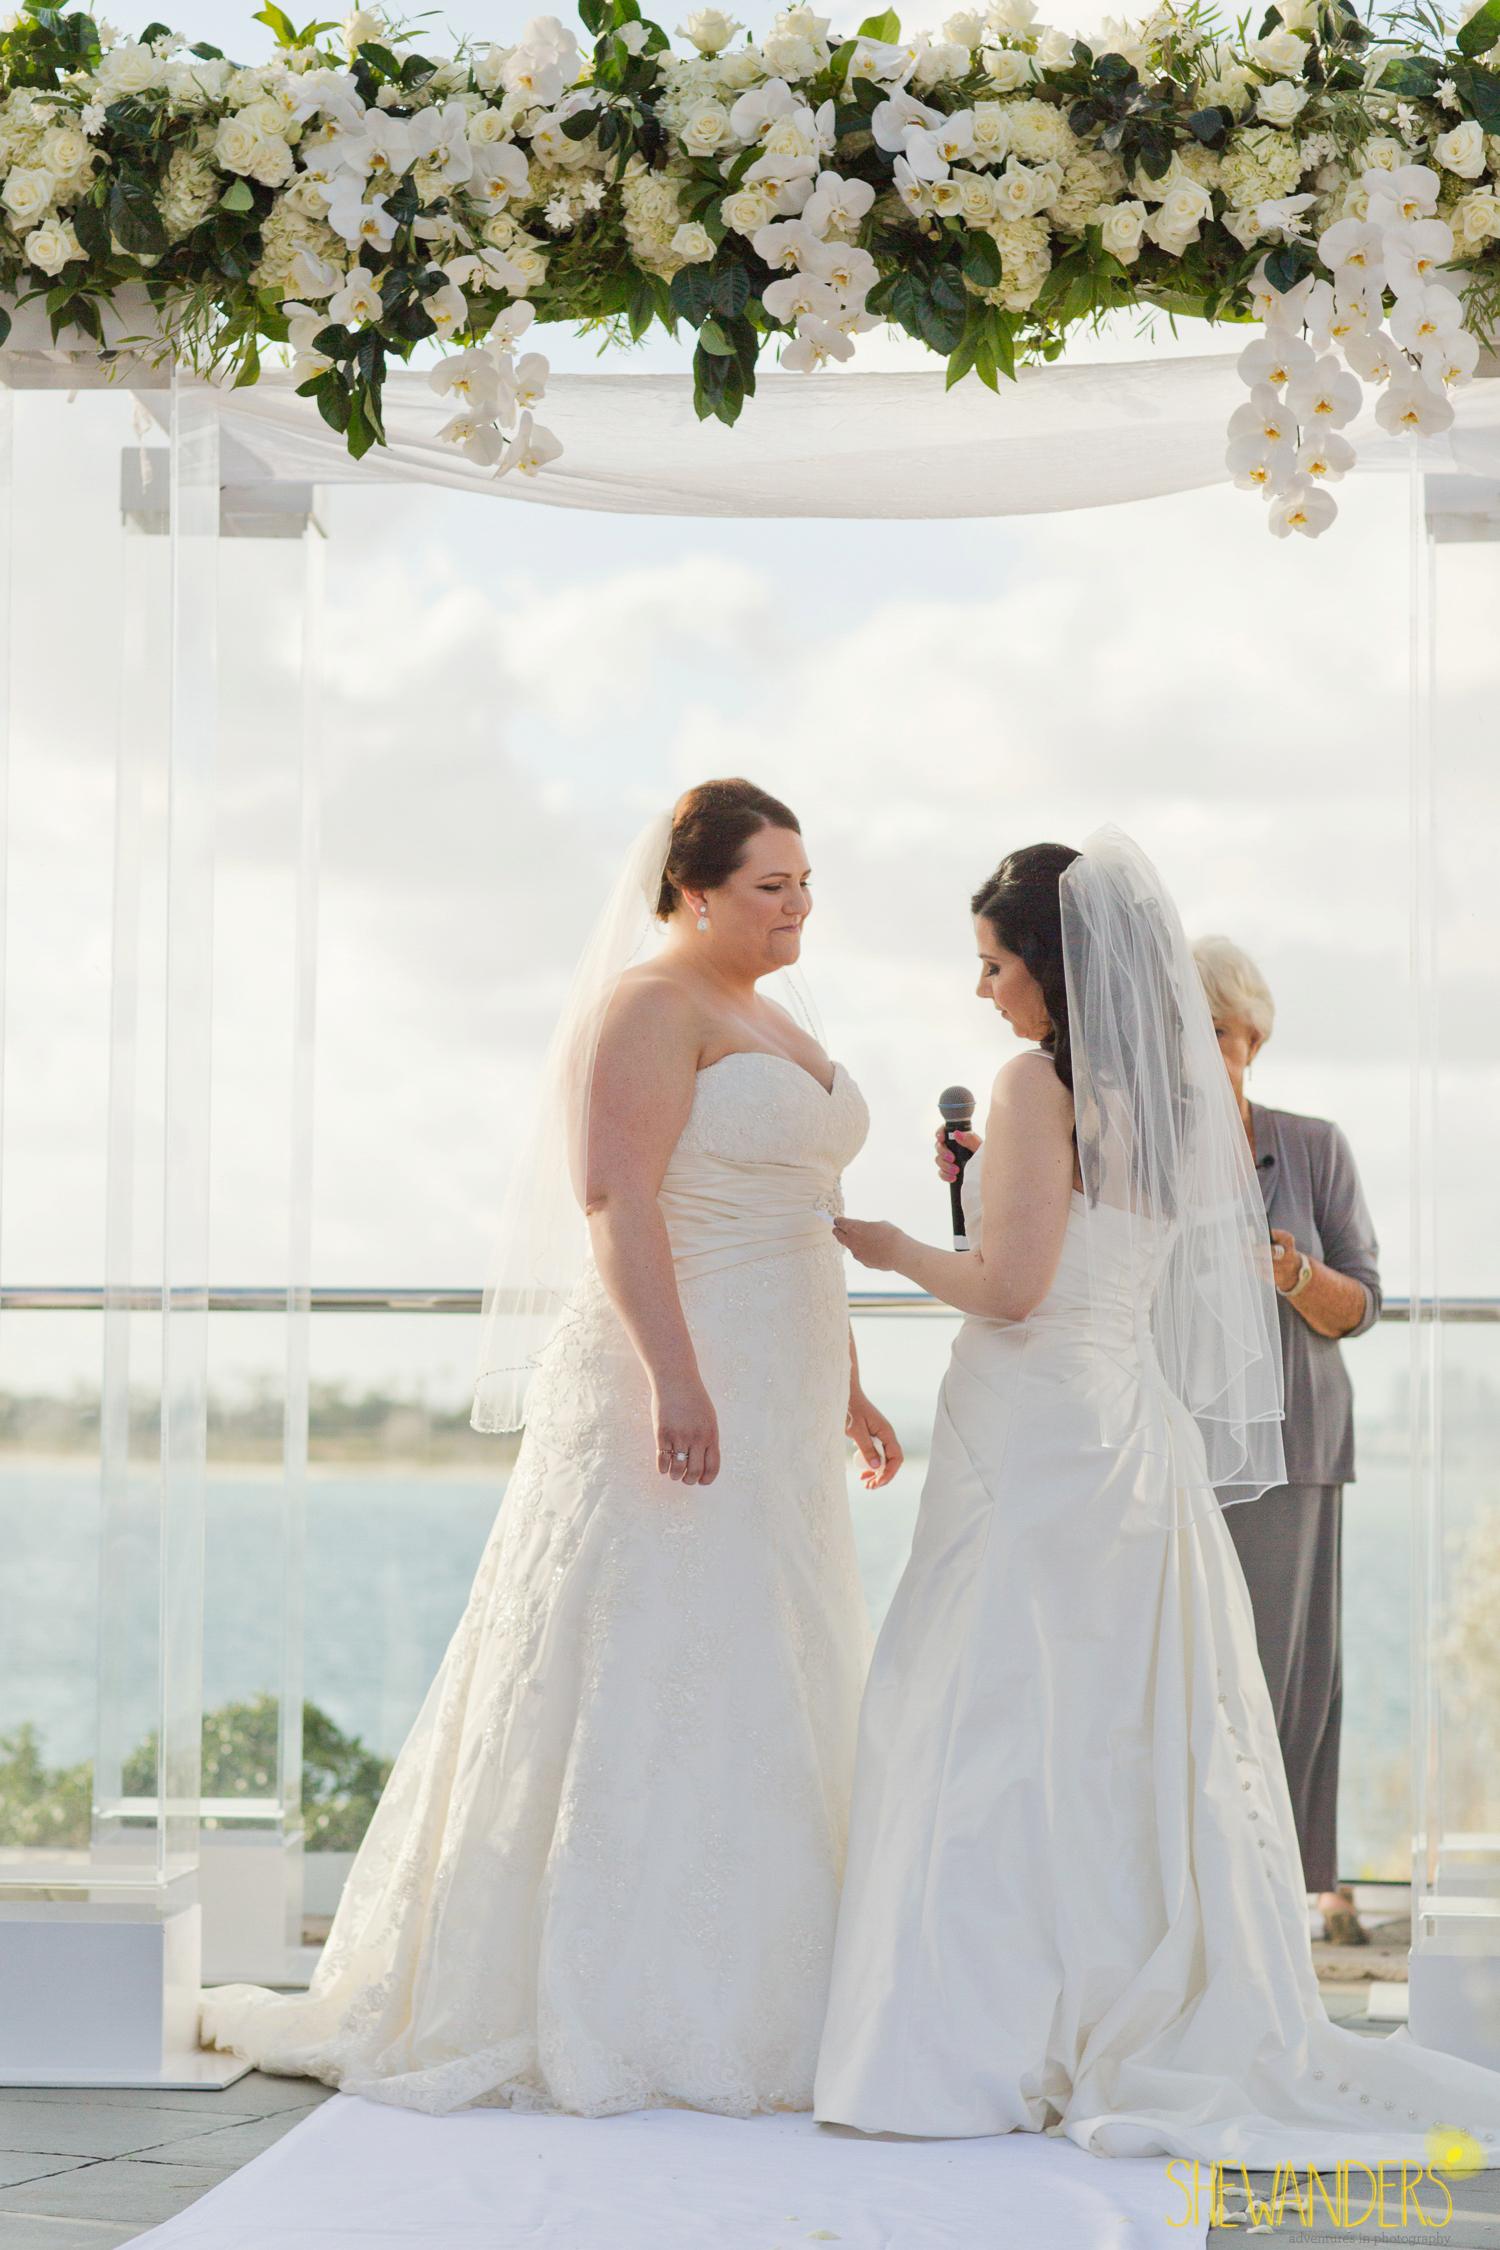 Shewanders.Coronado.Wedding.LaurenJessica-1022.jpg.Wedding.LaurenJessica-1022.jpg